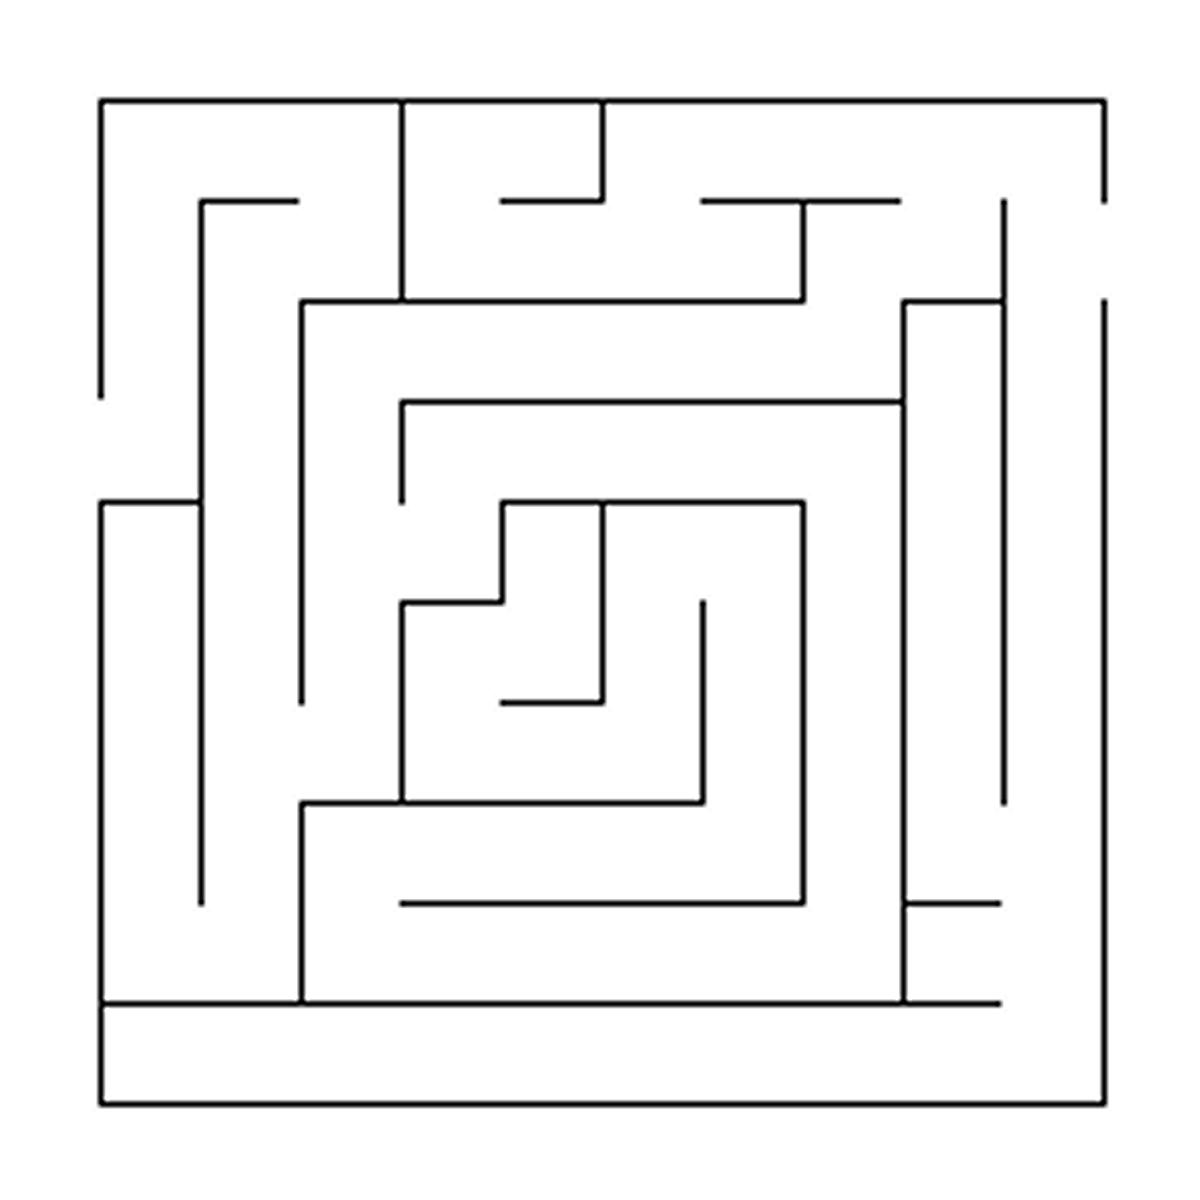 Http Coloringbookfun Com Mazes Easy 20mazes Originalimages 40932mmdus Png Maze Design Maze Coloring Pages